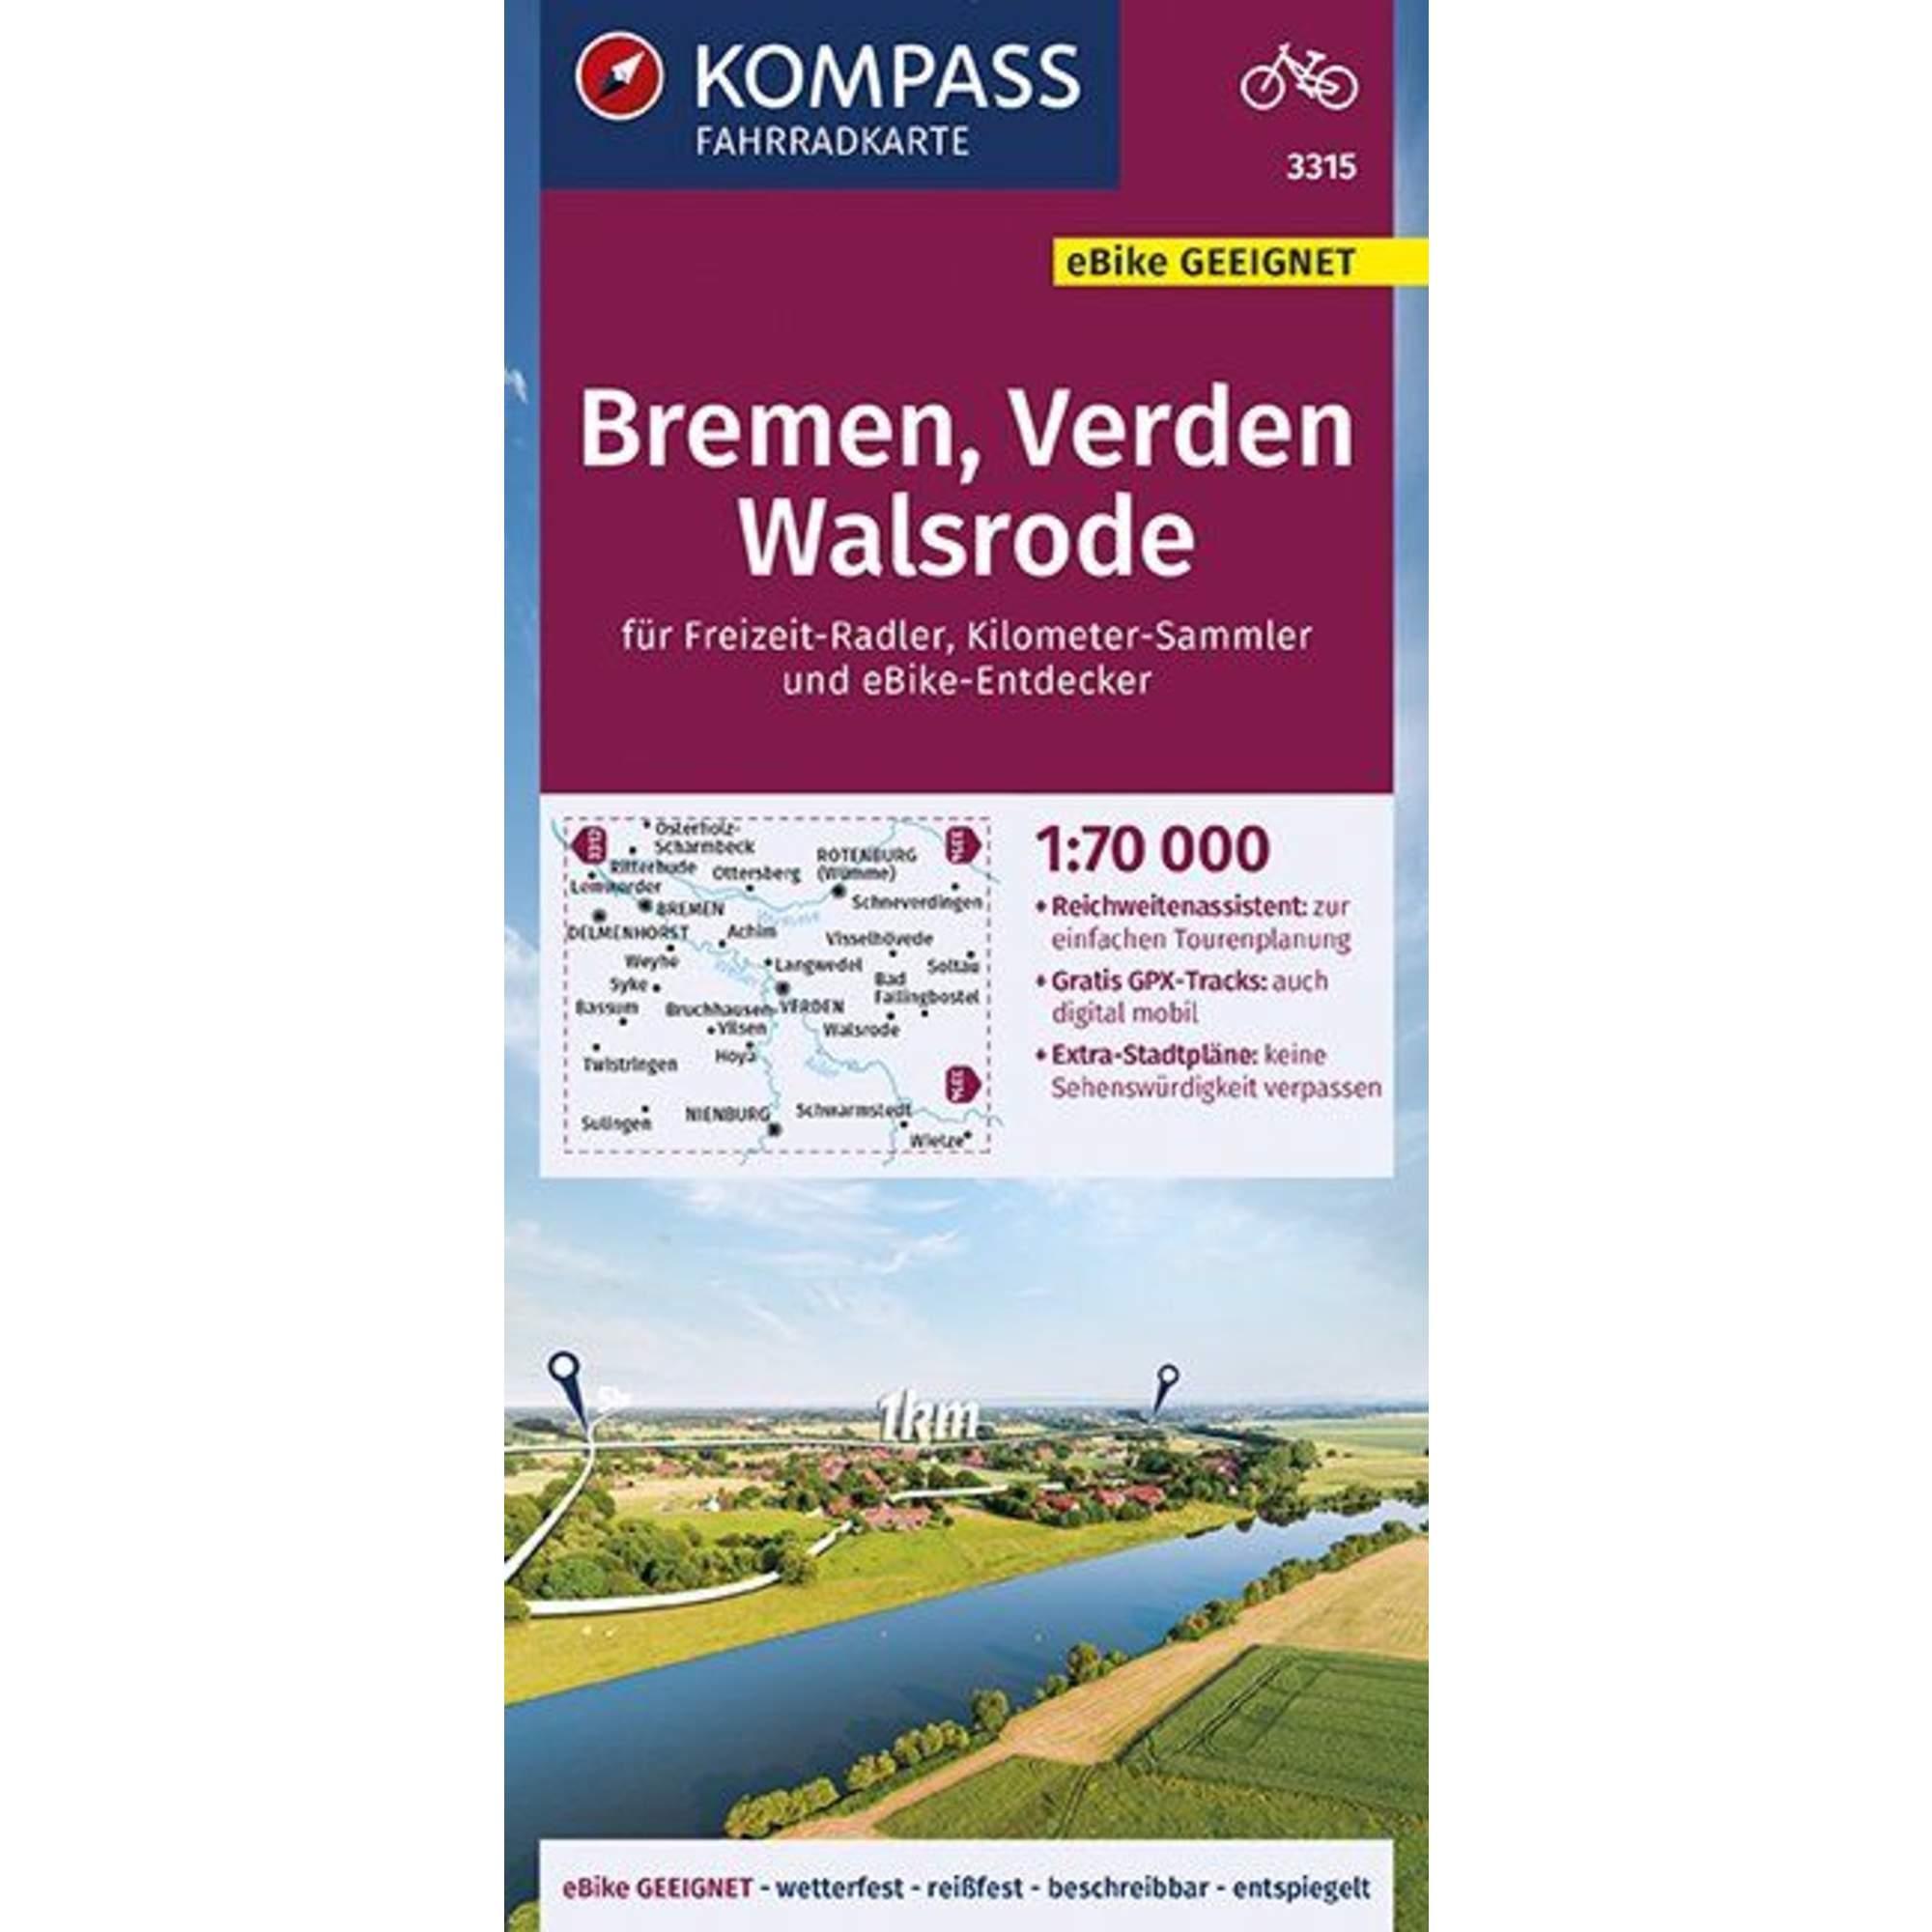 KOMPASS FAHRRADKARTE BREMEN, VERDEN, WAL -  Fahrradkarten